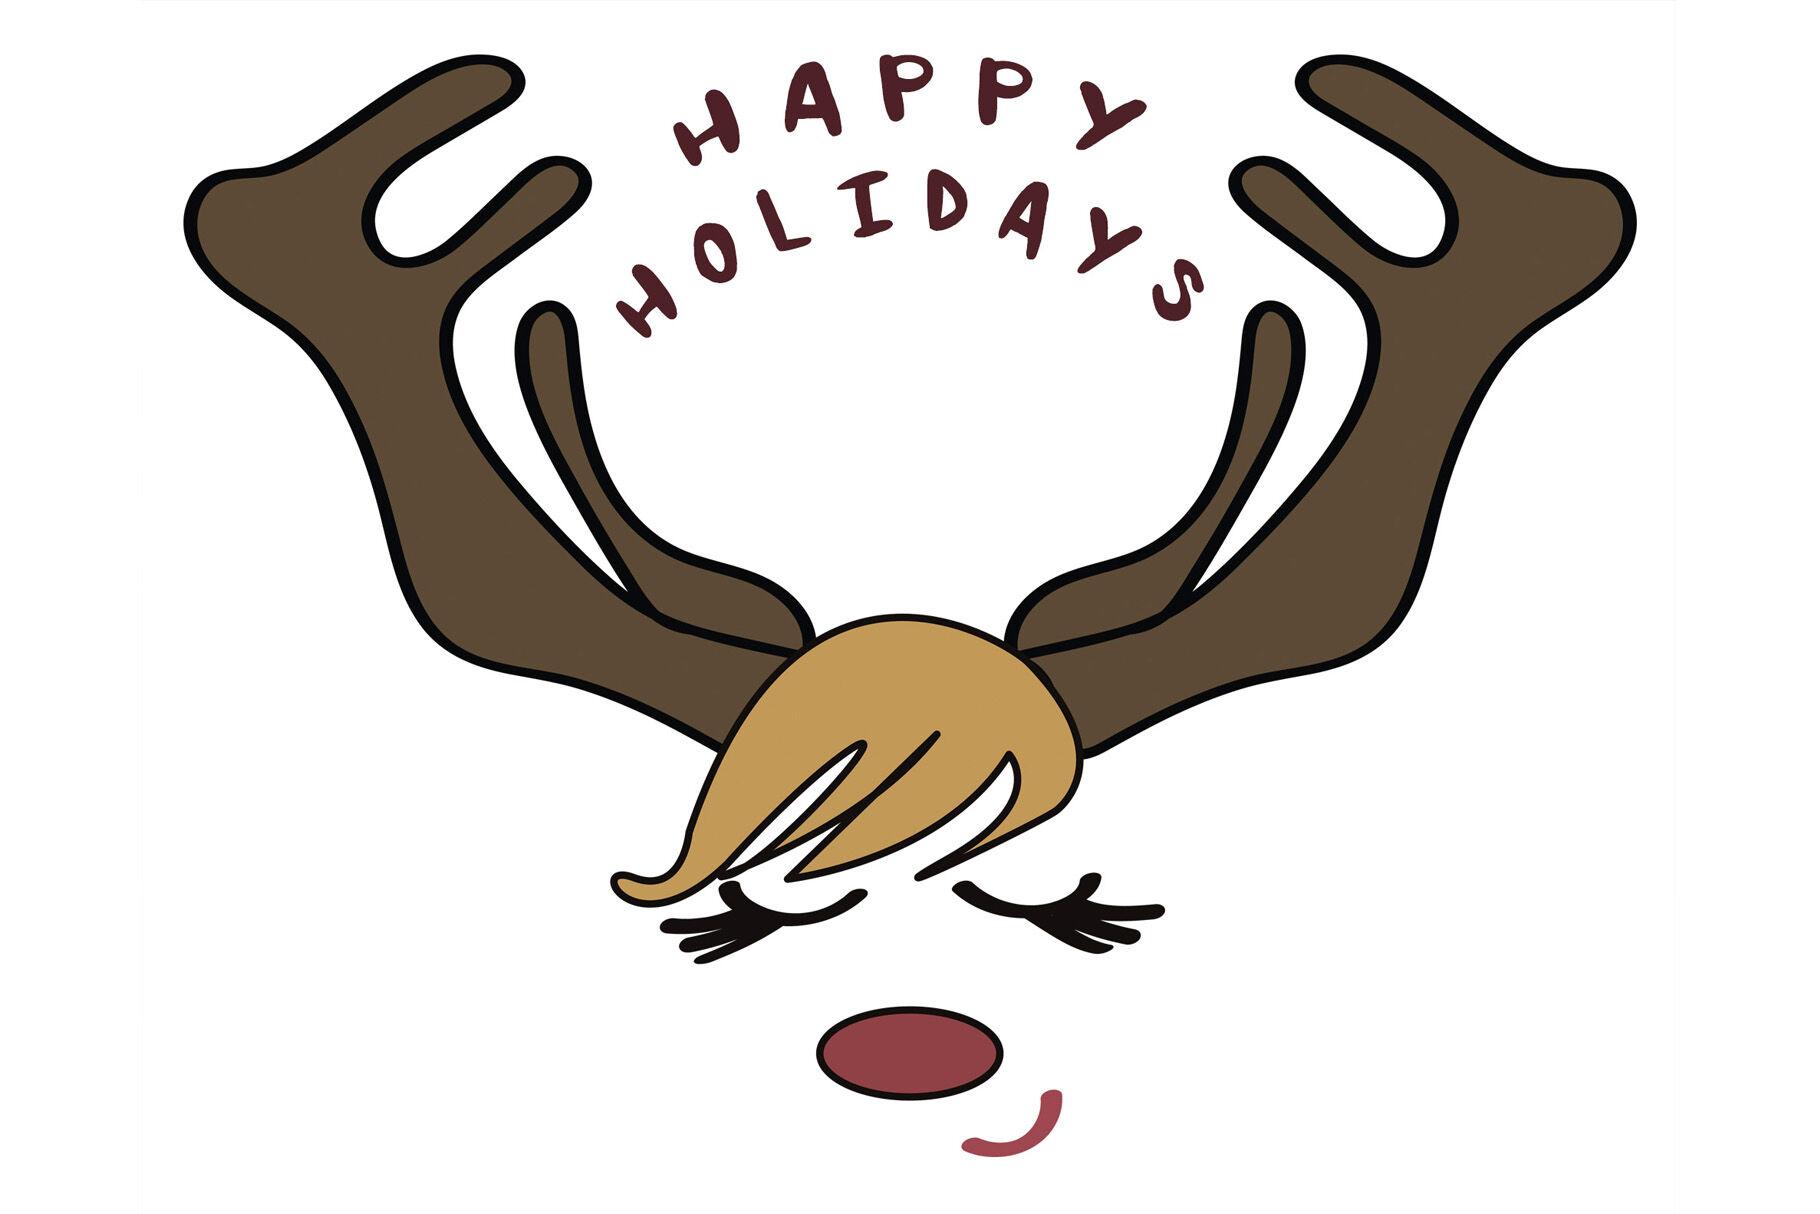 Christmas Reindeer Face By Inna Lytvynchuk Thehungryjpeg Com